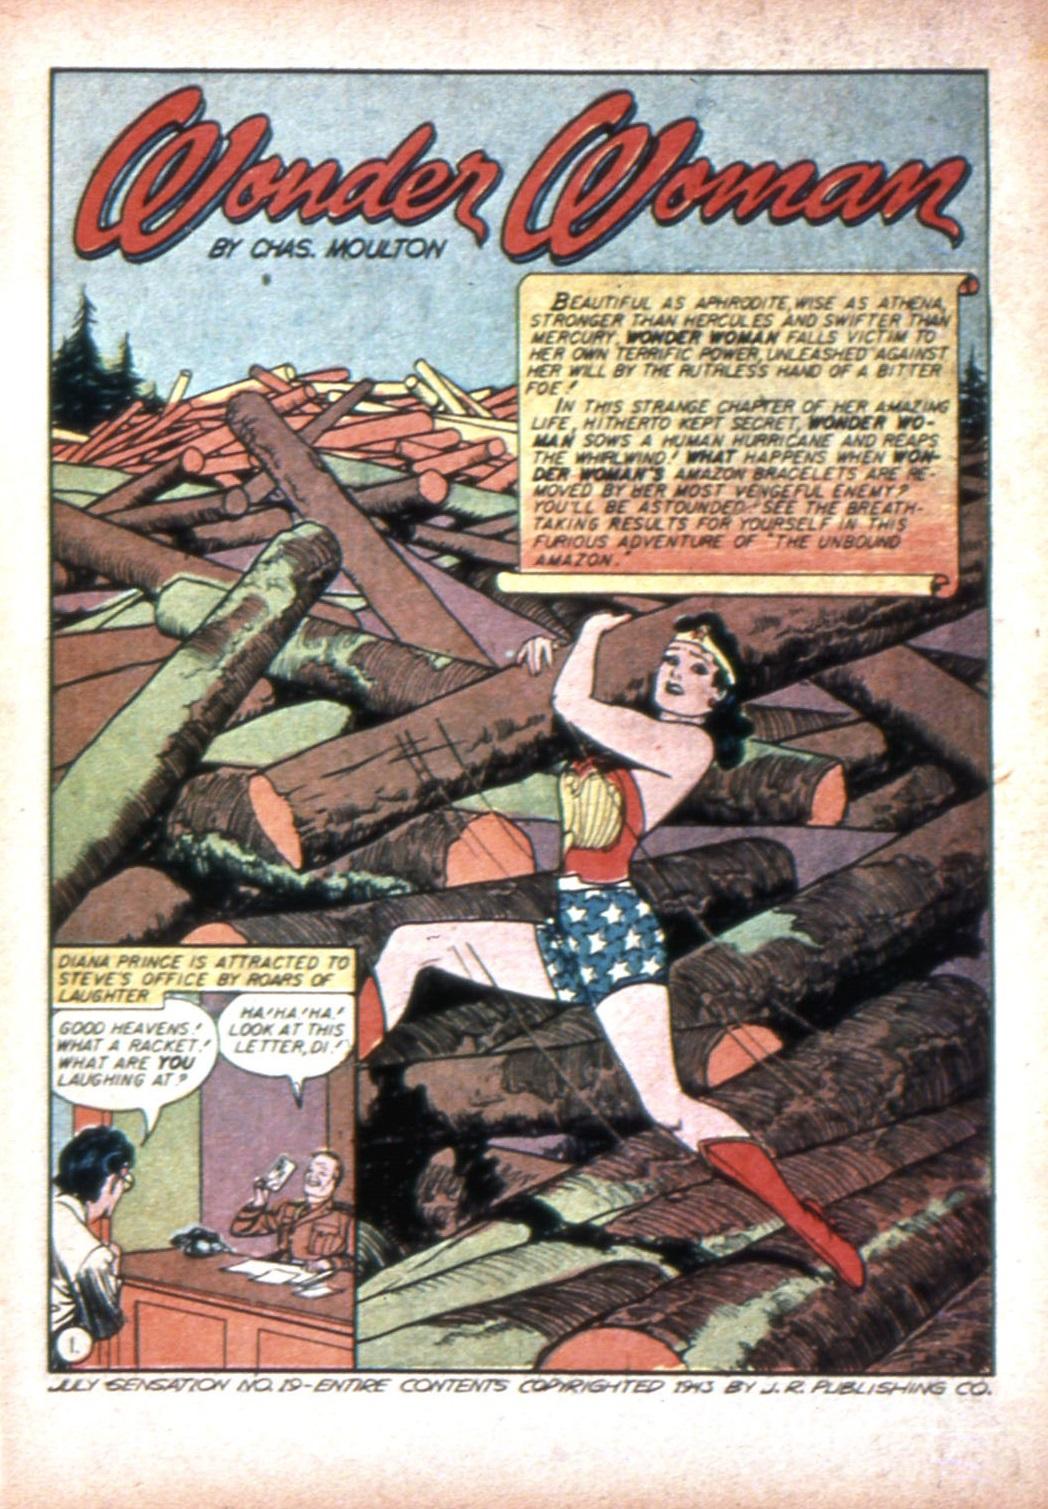 WW-berserk-01-sensation comics 19-02